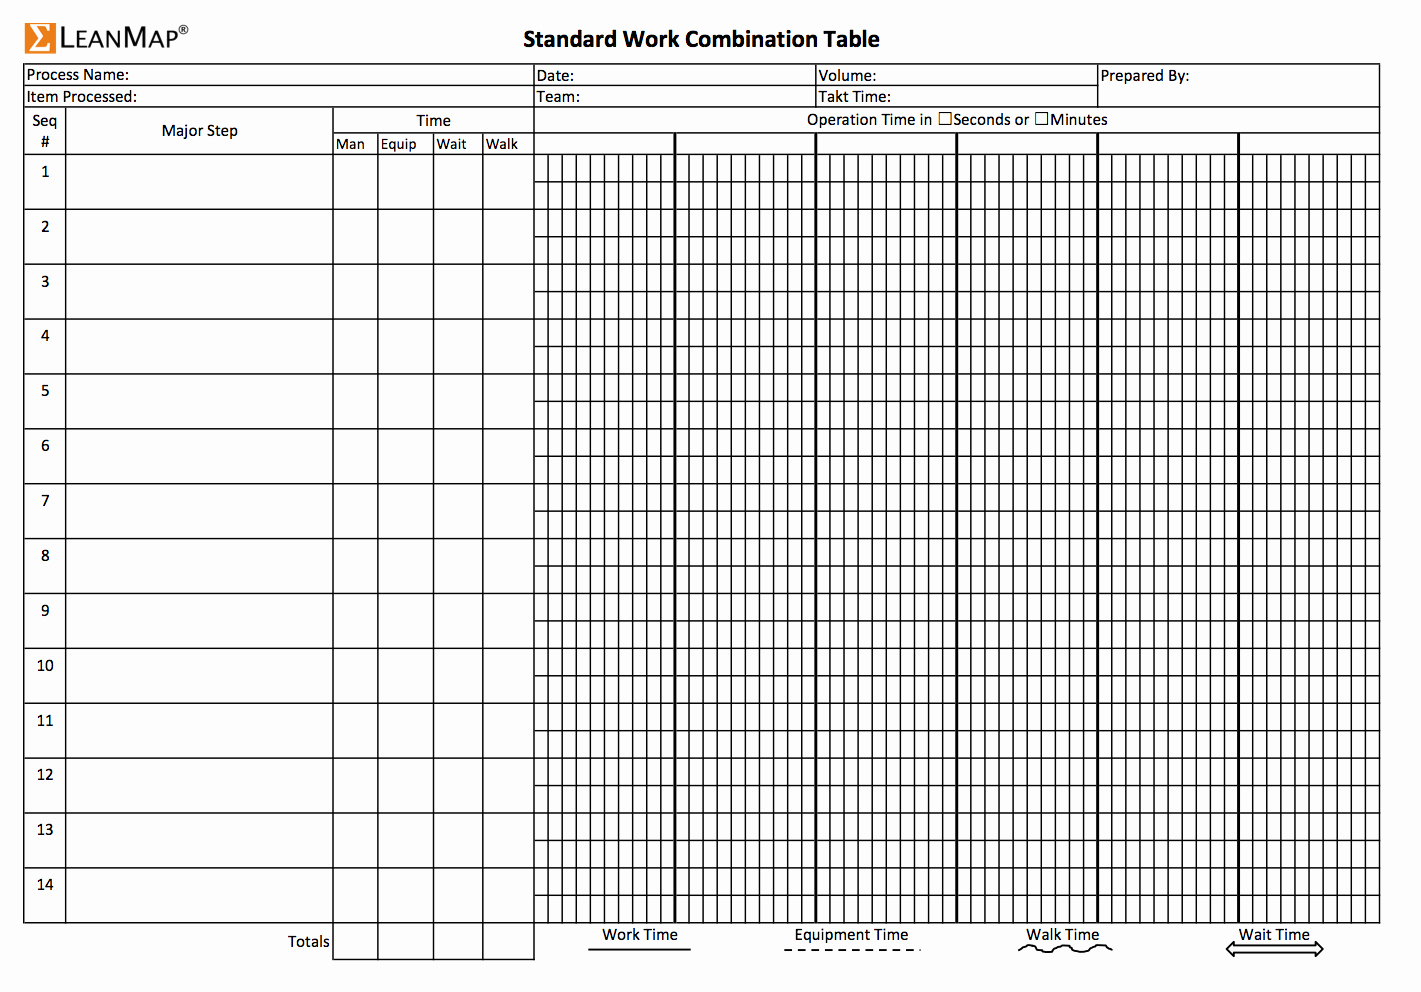 Standardized Work Templates Excel Elegant Lean Standard Work Template Excel Stdworktable 600 Templates Data